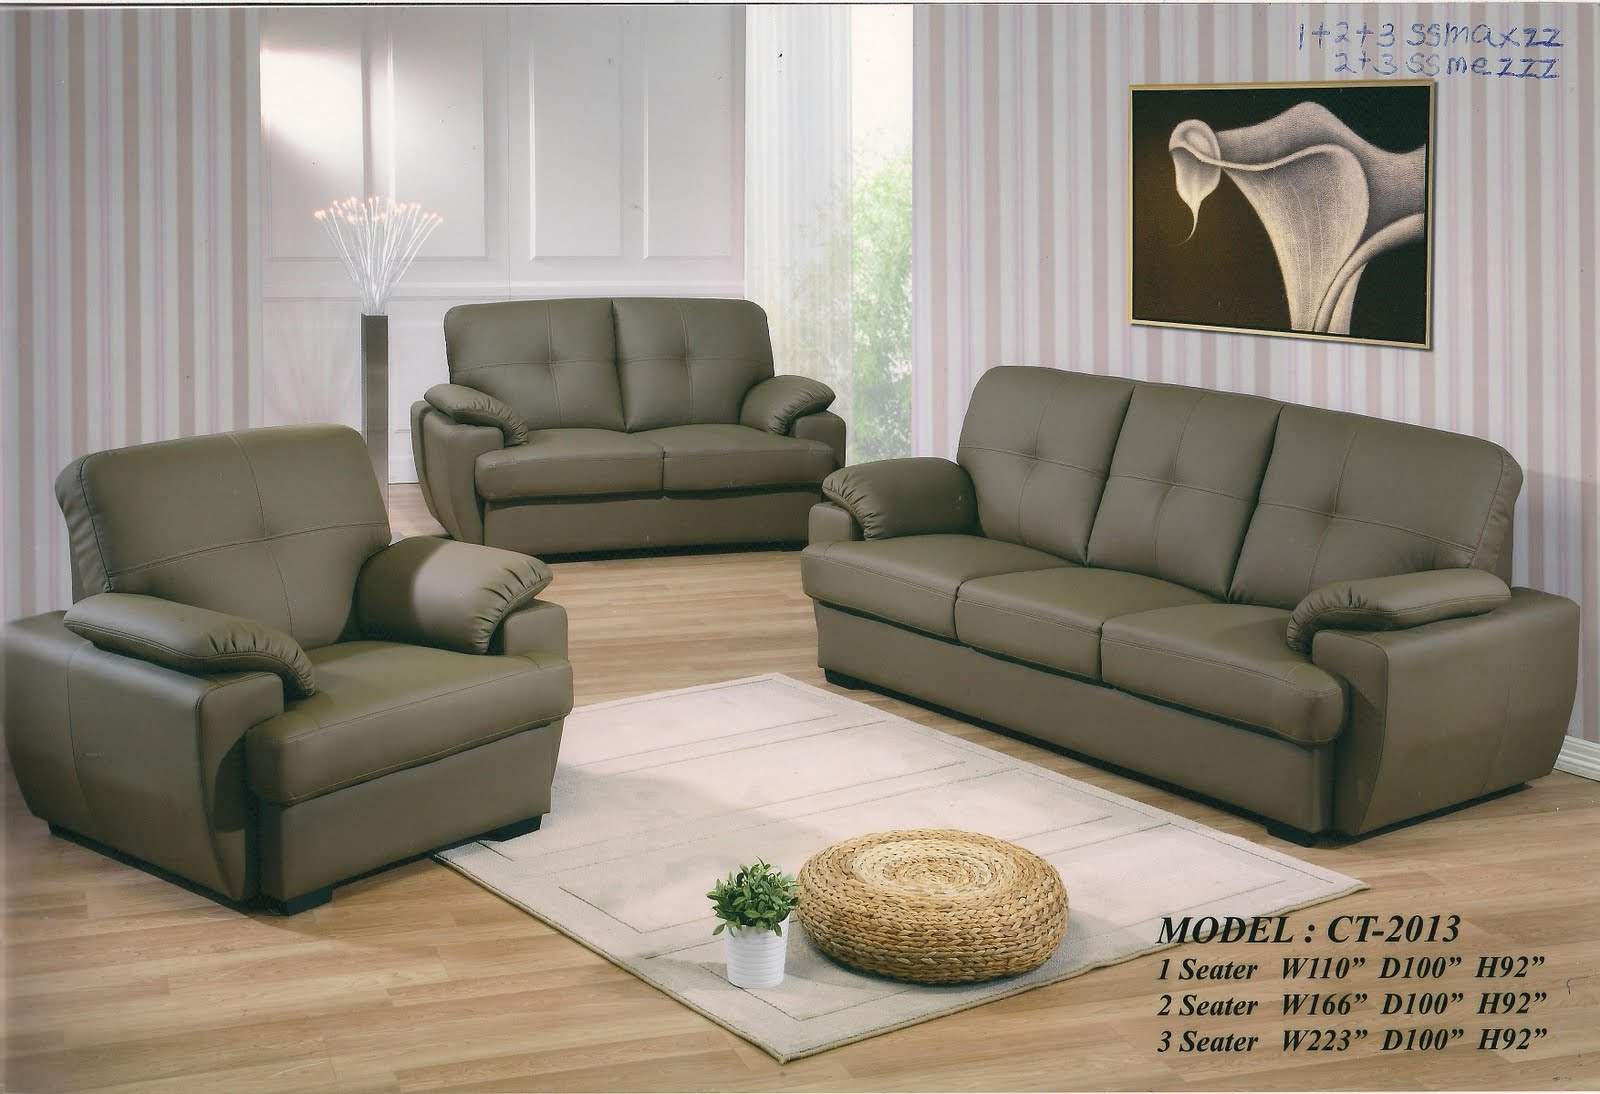 one and half seater sofa contemporary outdoor uk perabot kamilatan set 1 43 2 3